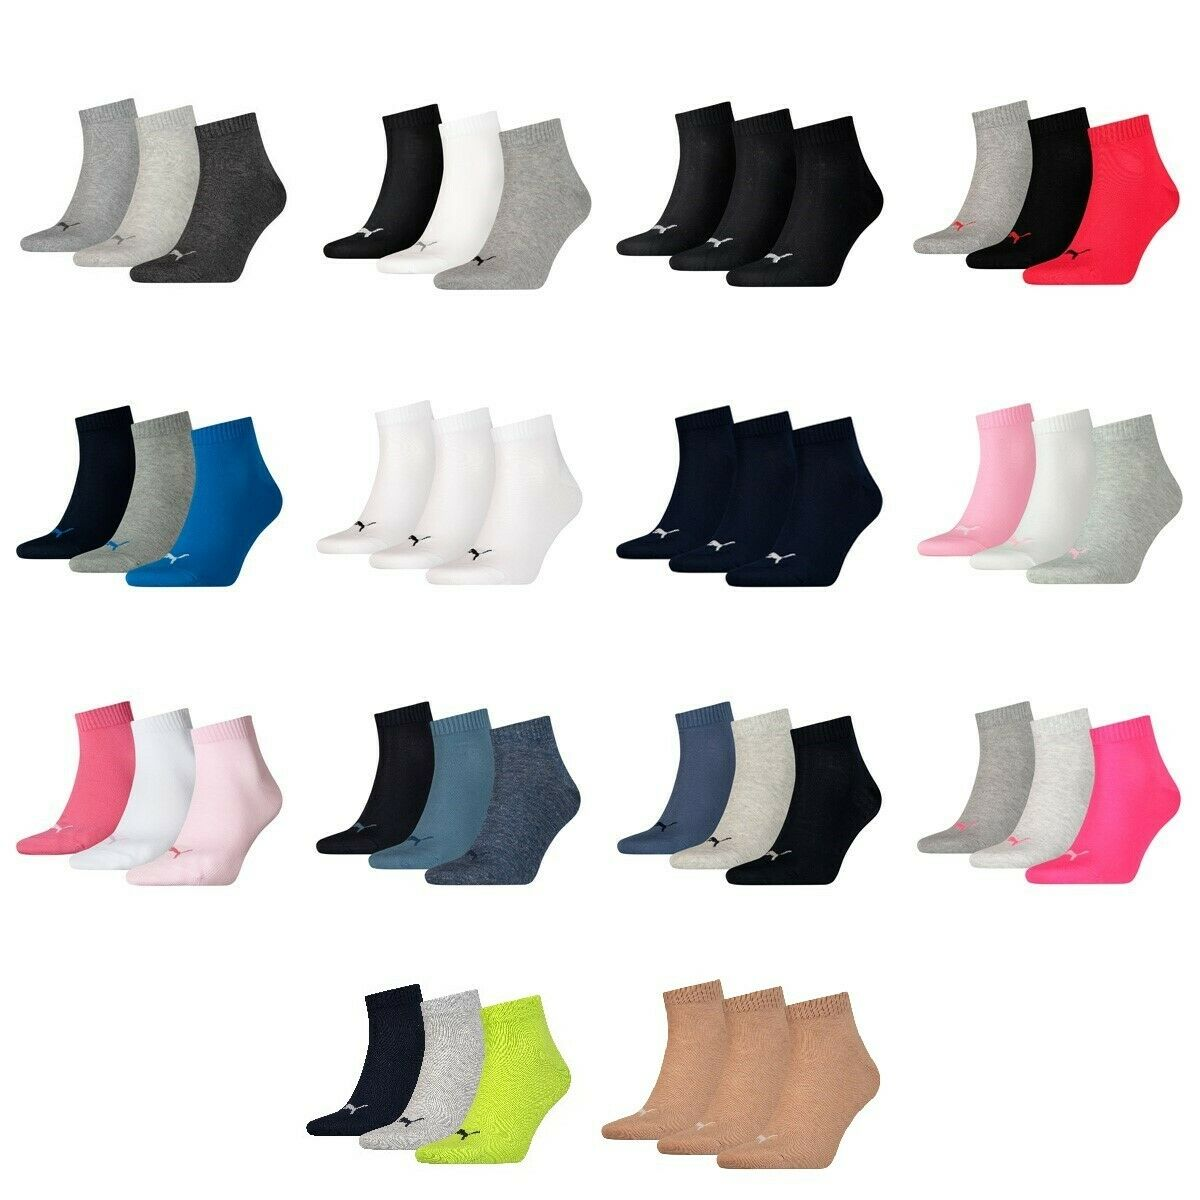 6 Paar Puma Unisex Quarter Socken Sneaker Gr. 35 - 49  für Damen Herren Füßlinge